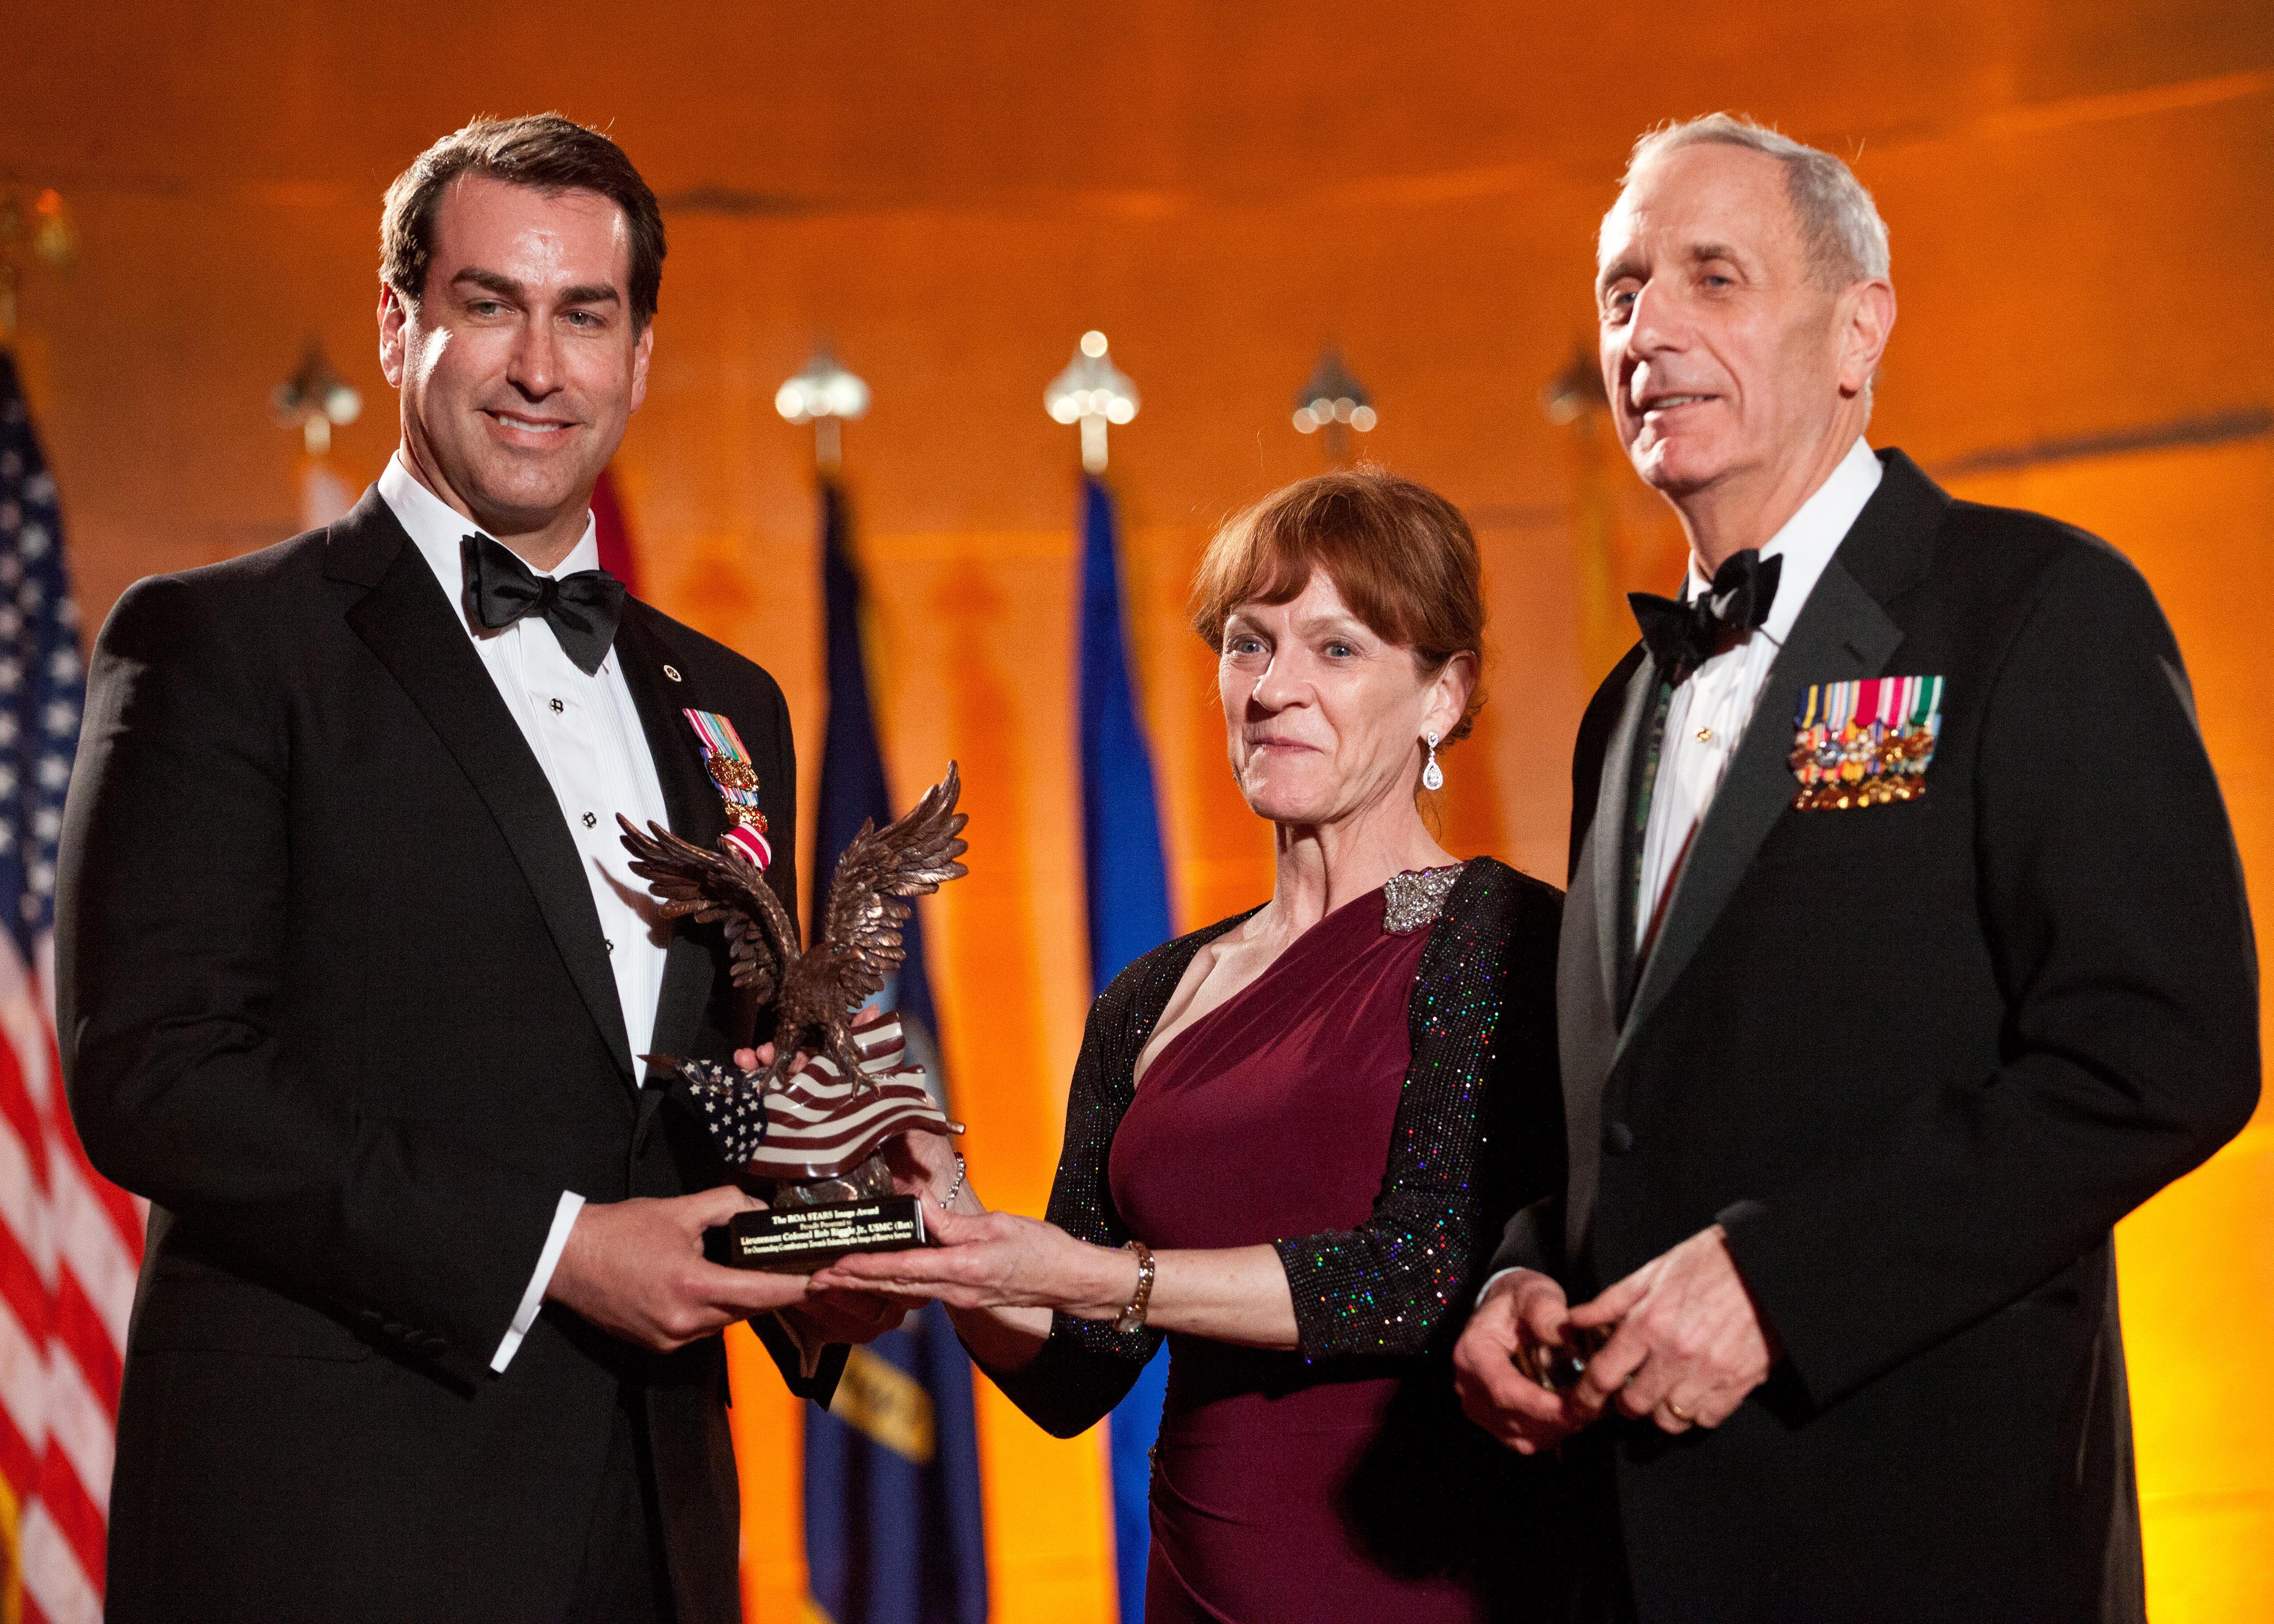 U.S. Marine Corps Retired Lt. Col. Robert Riggle, Jr., Left,